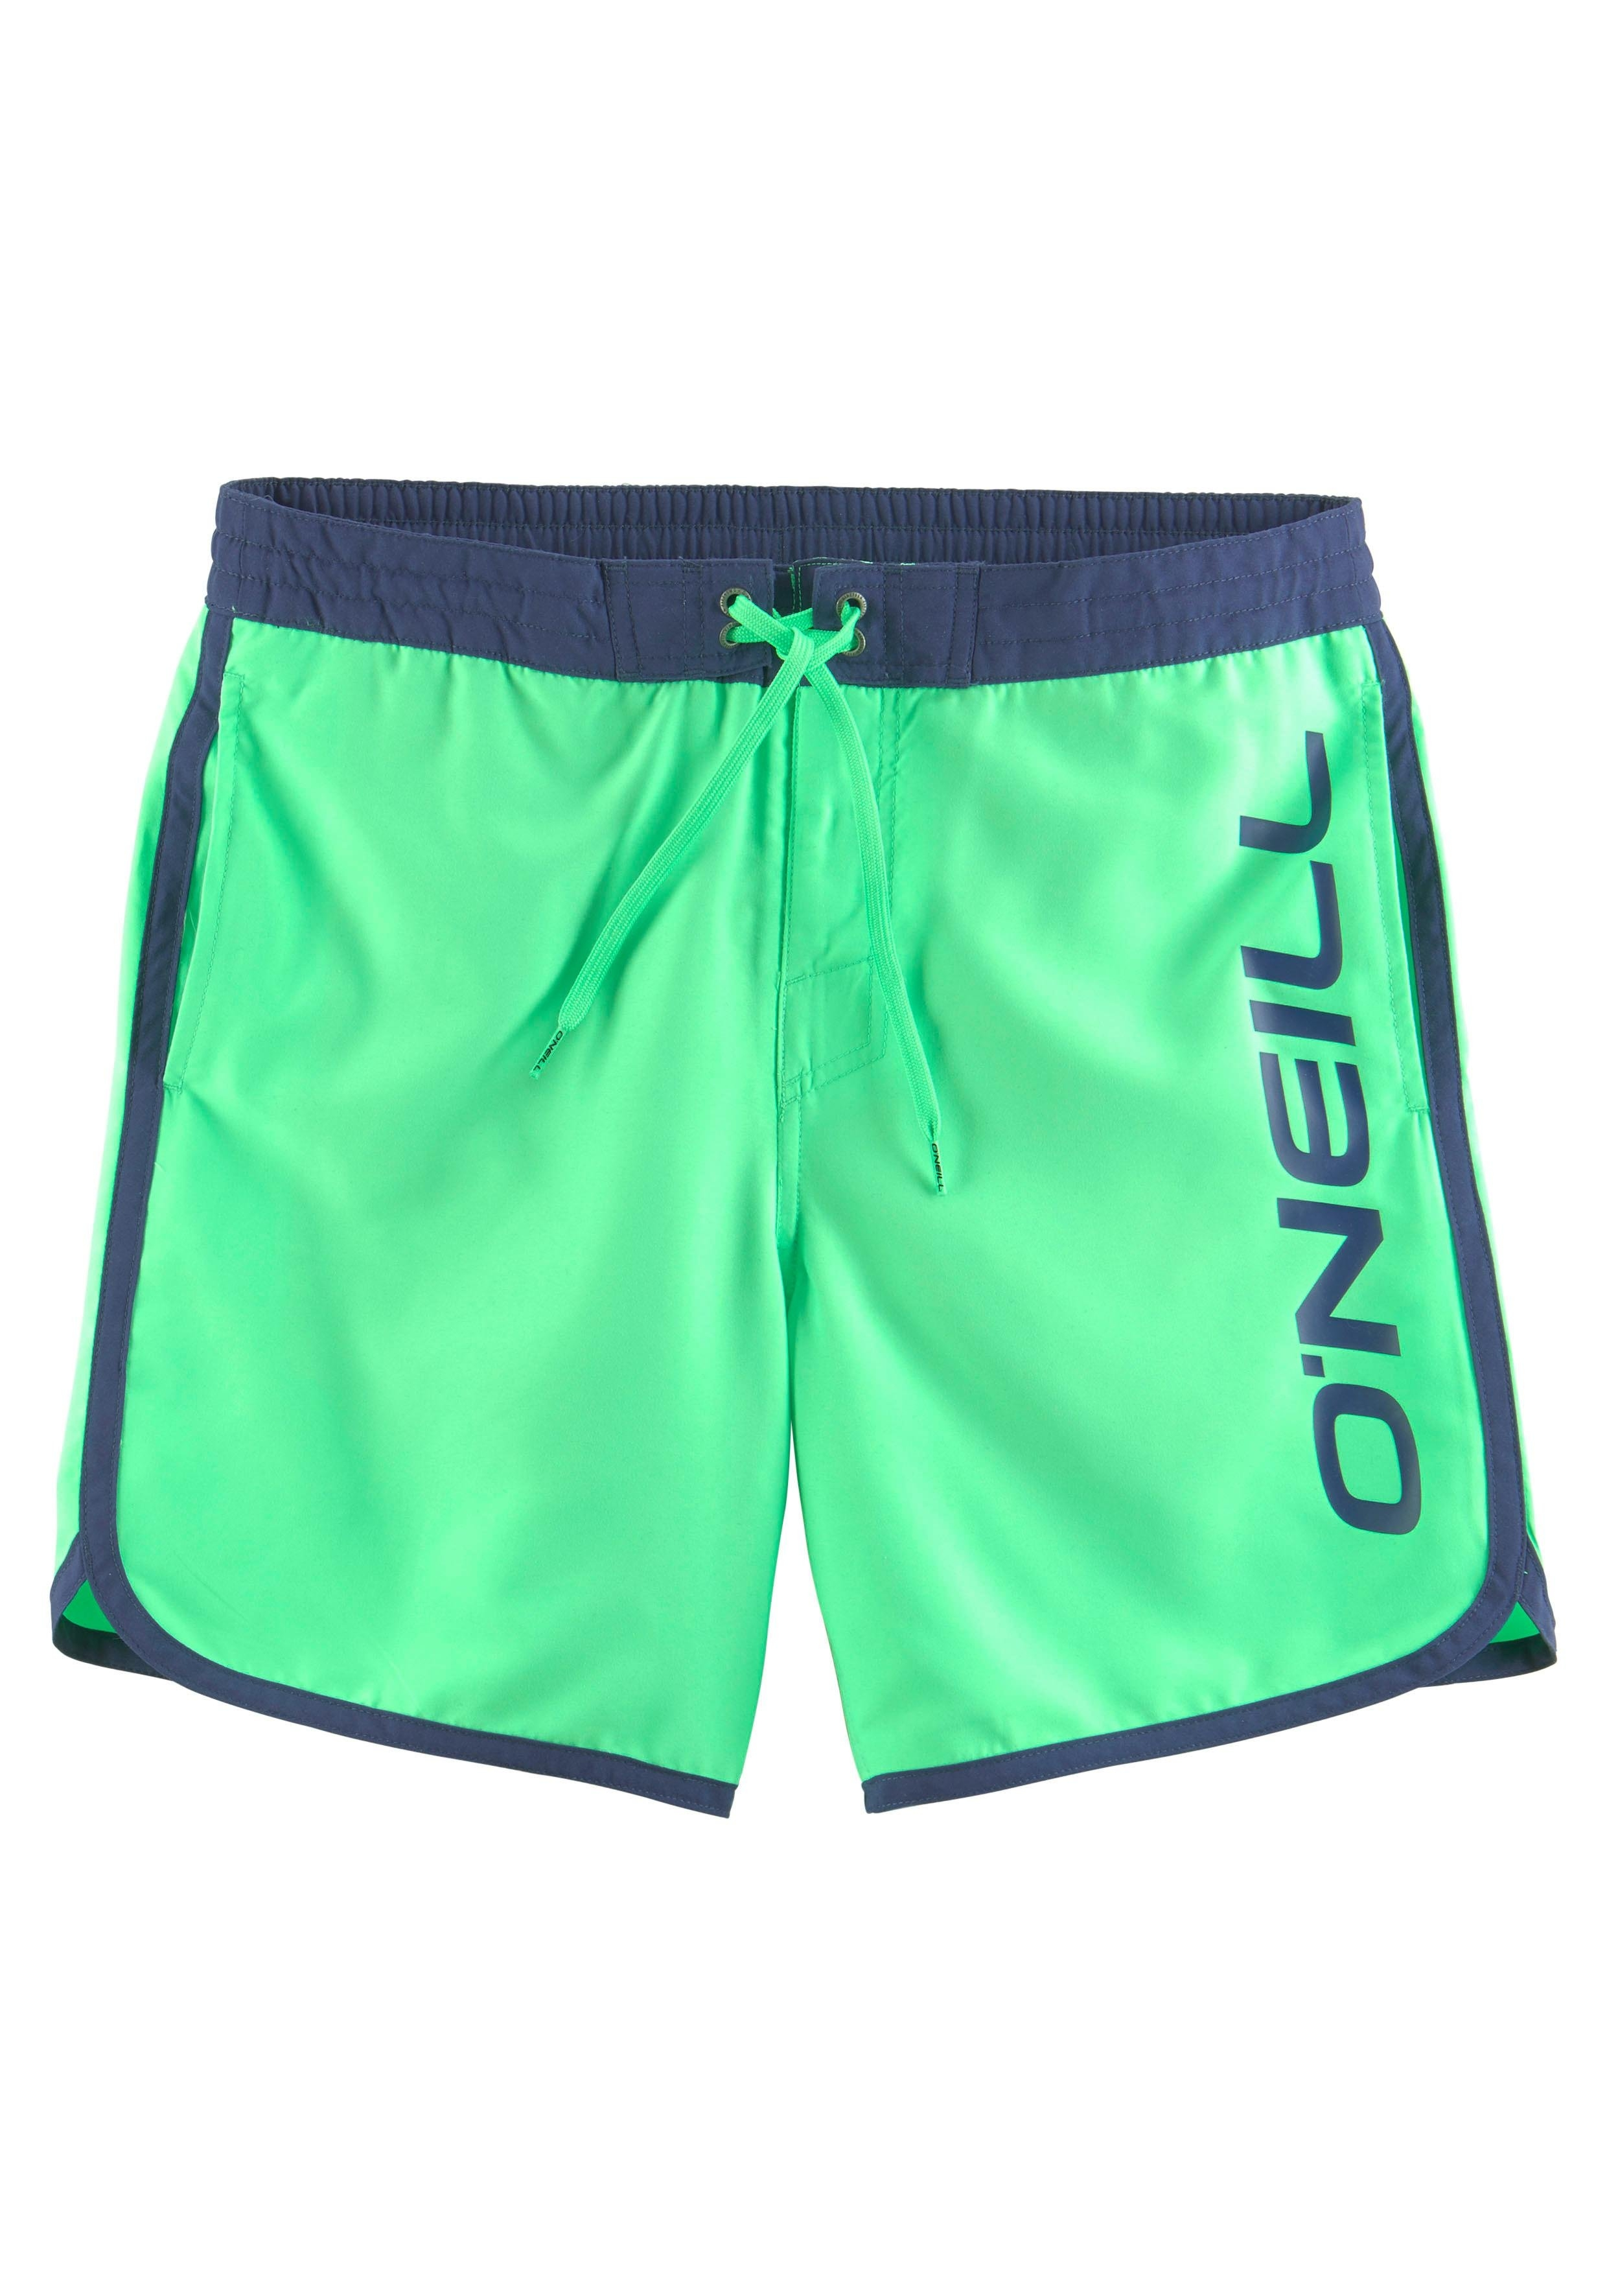 O'Neill zwemshort bestellen: 30 dagen bedenktijd